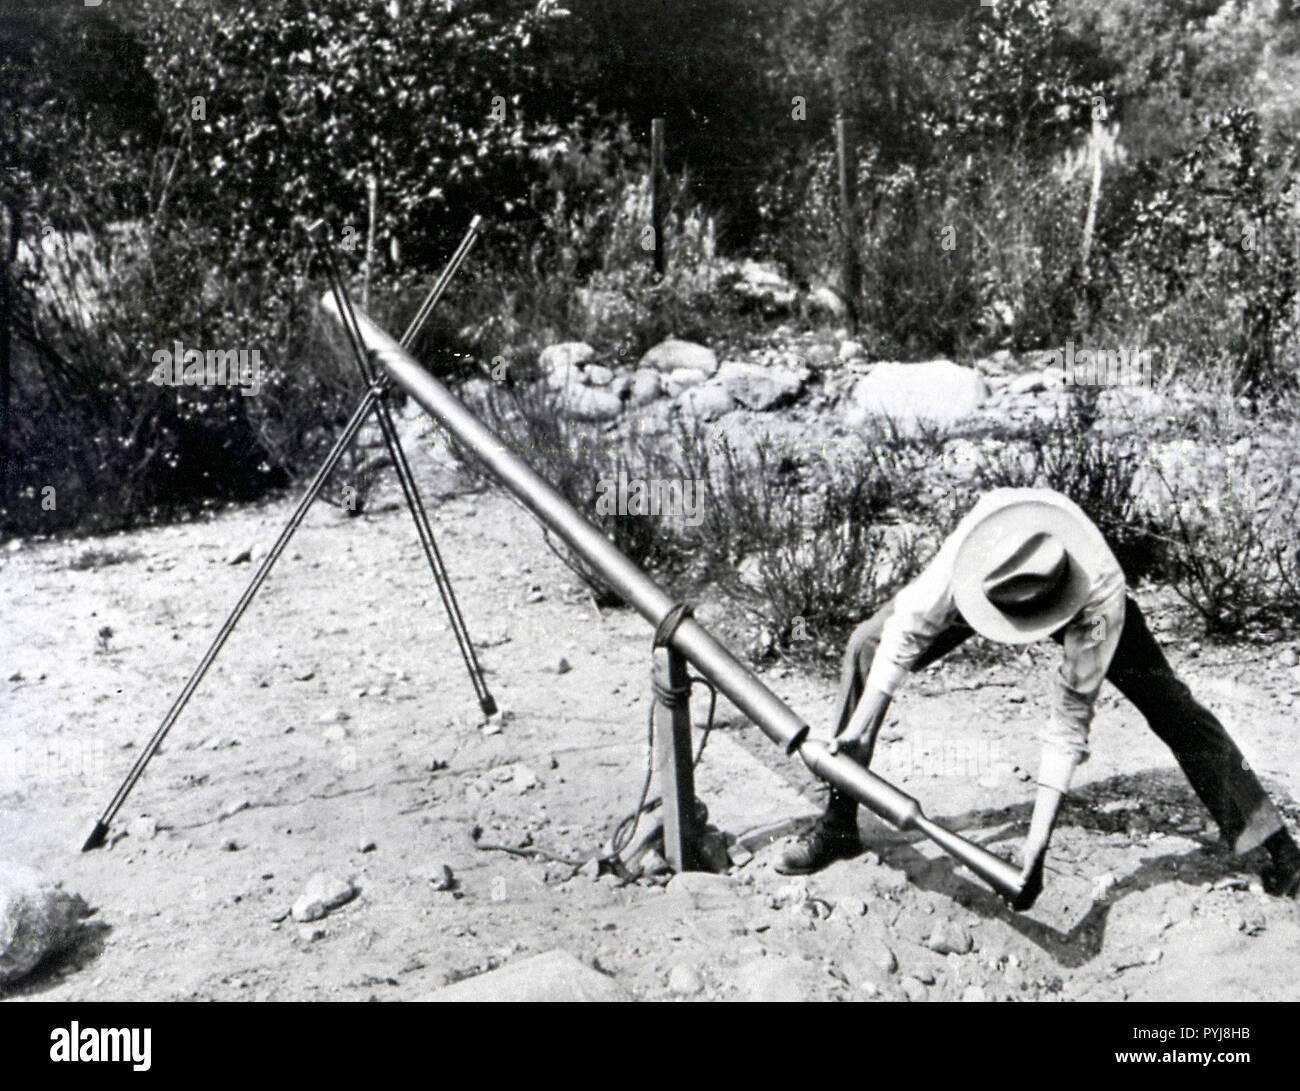 doctor-goddard-robert-h-loading-a-1918-version-of-the-bazooka-of-world-war-ii-at-mt-wilson-obs-california-PYJ8HB.jpg